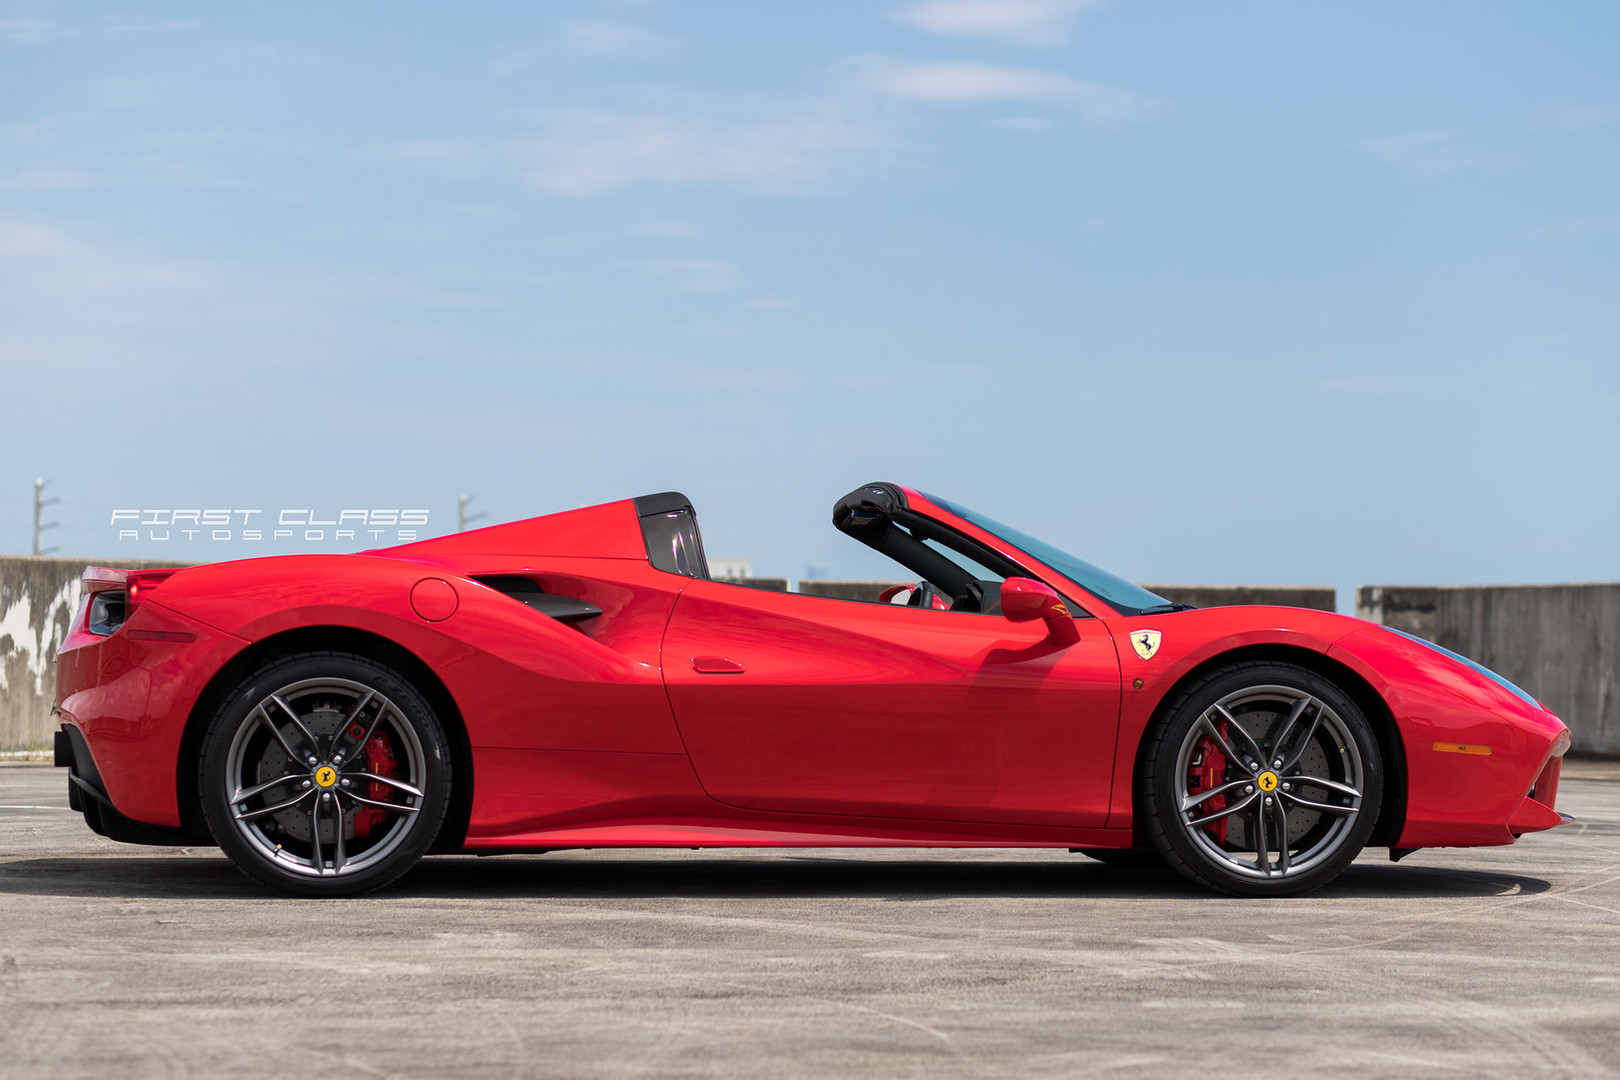 Ferrari Portofino Paint Protection Film Miami